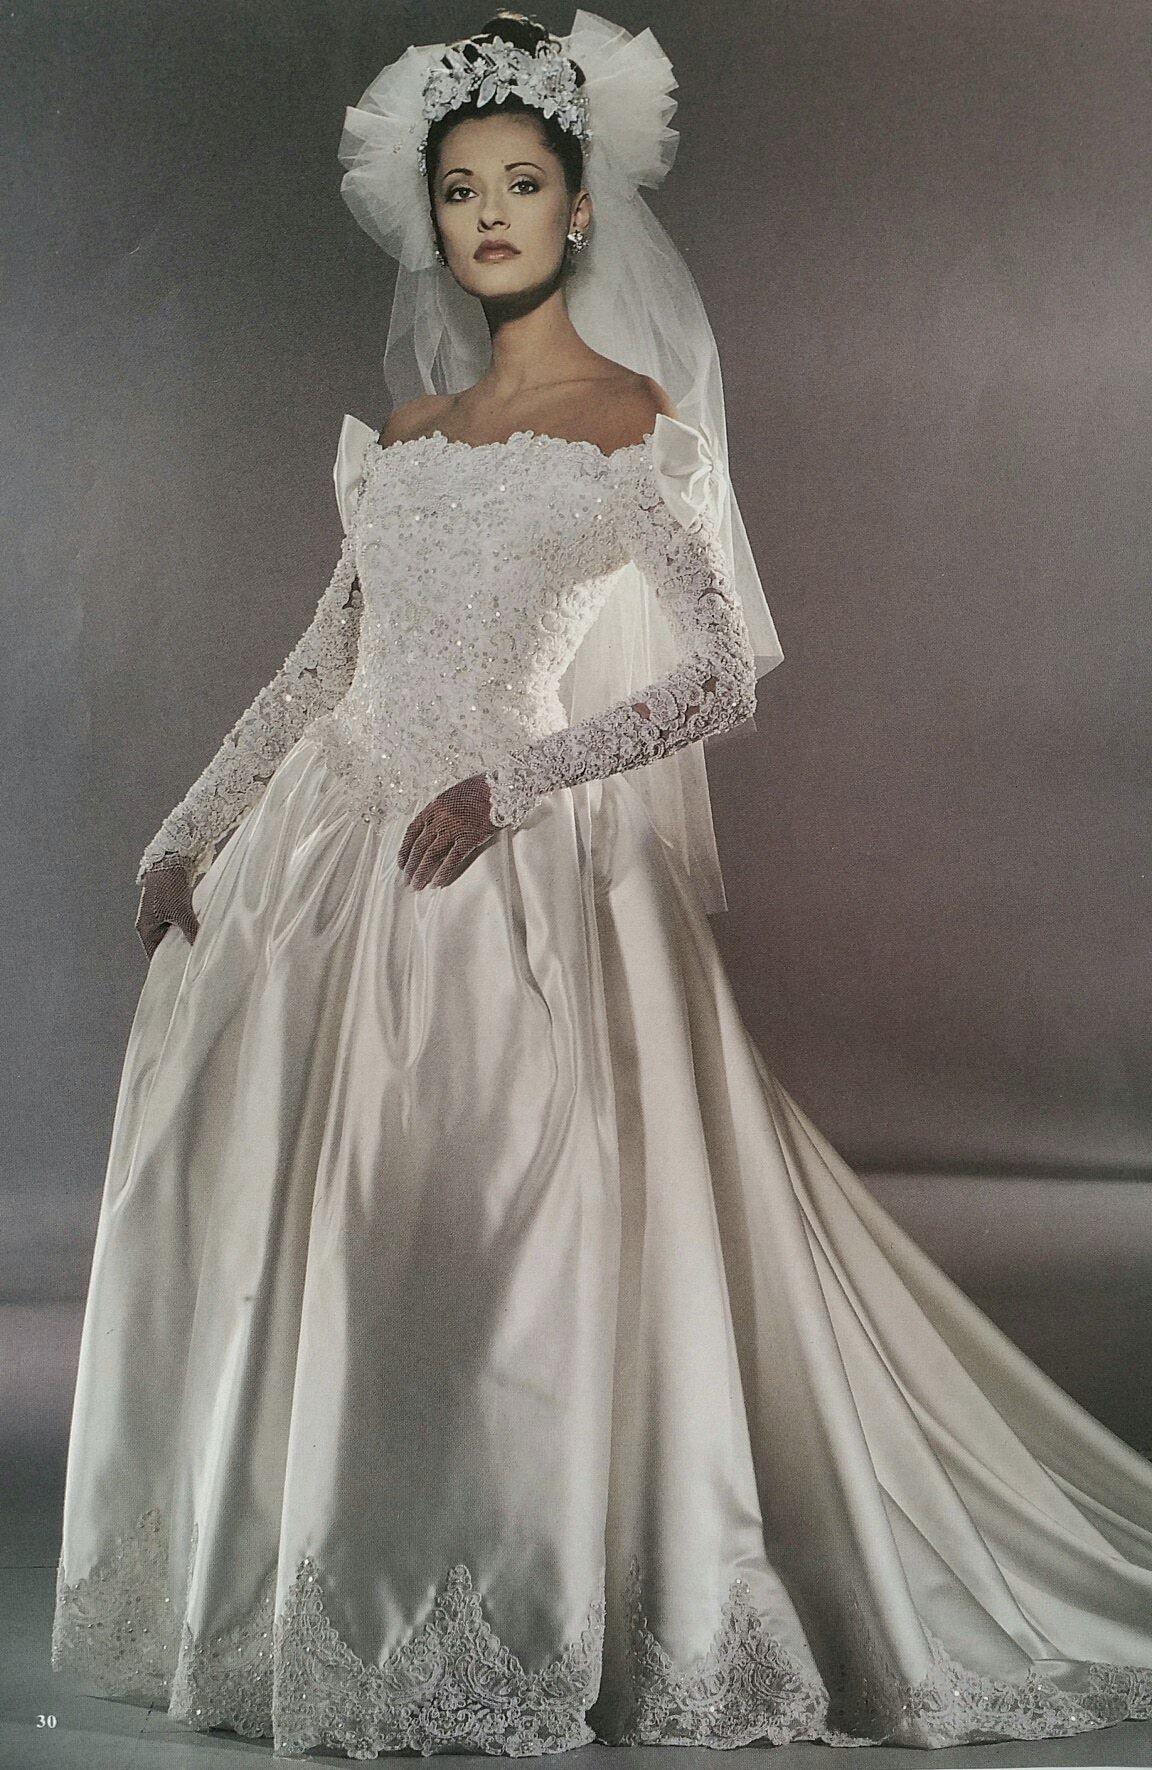 Demetrios 1995 90s Wedding Dress Wedding Dresses 80s Timeless Wedding Gown